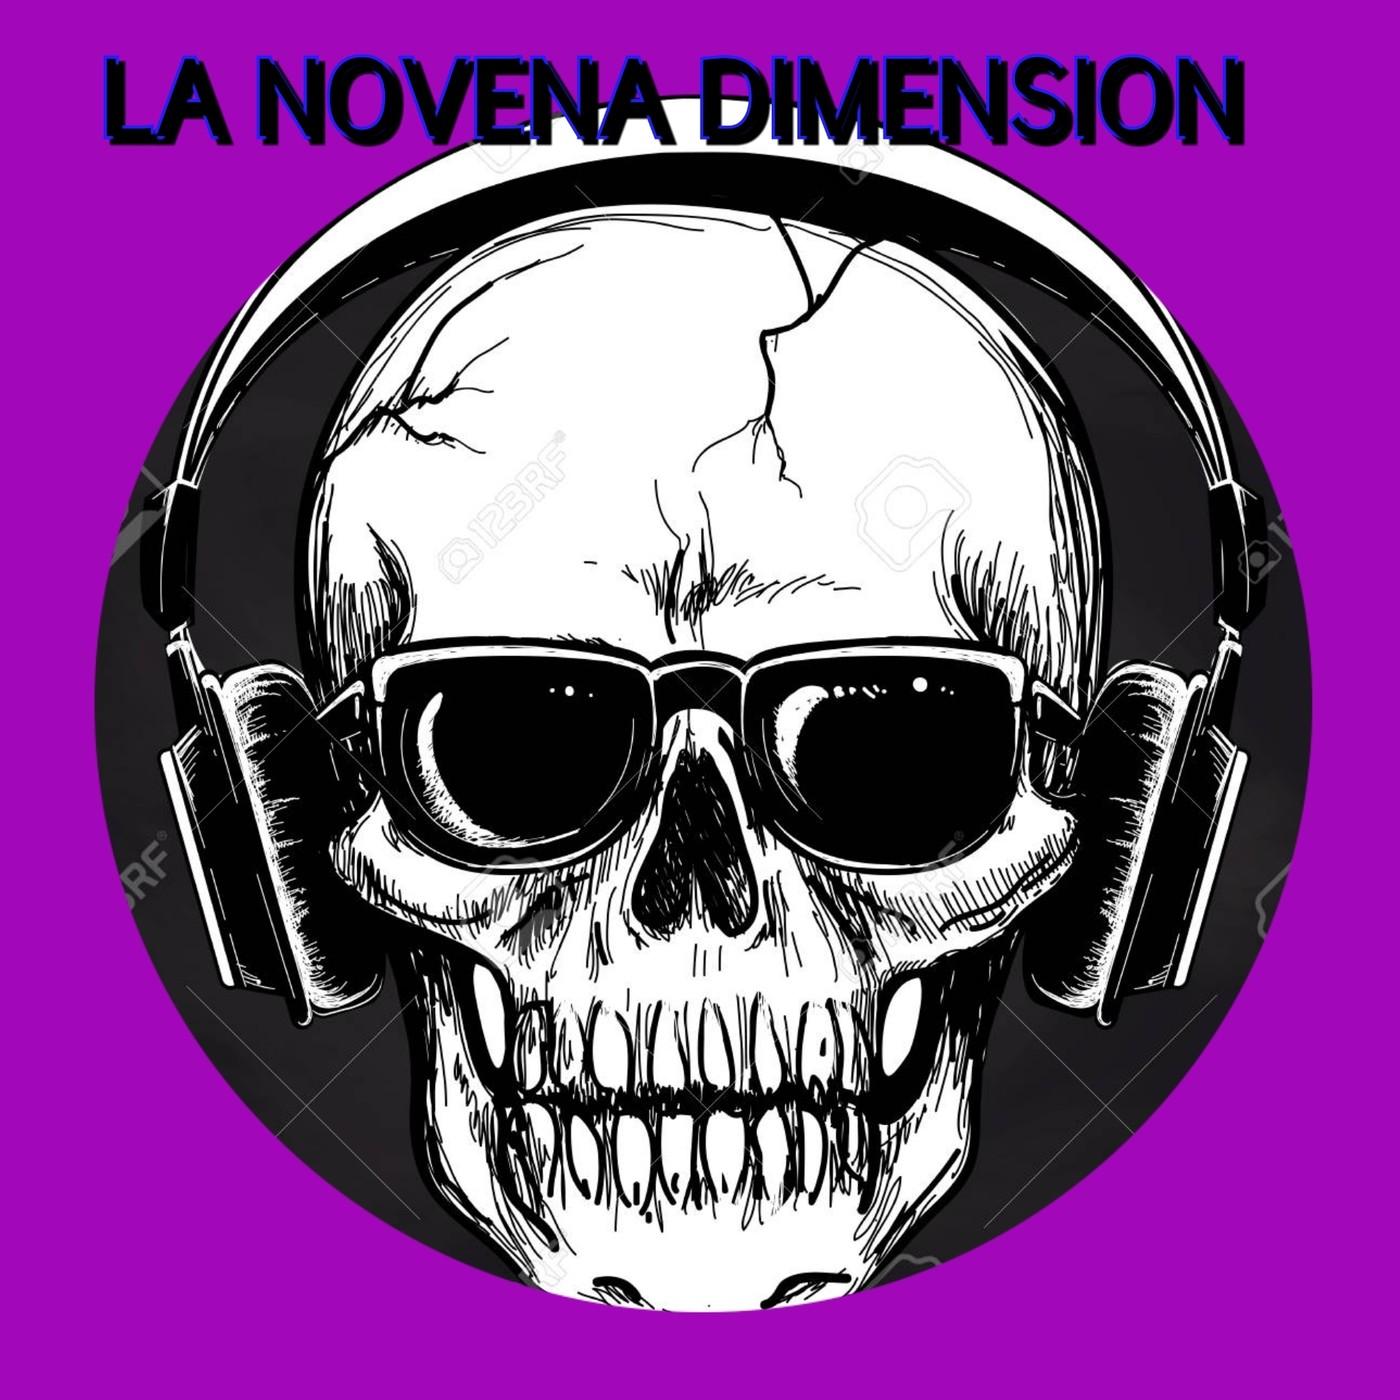 LA NOVENA DIMENSION HEAVY META